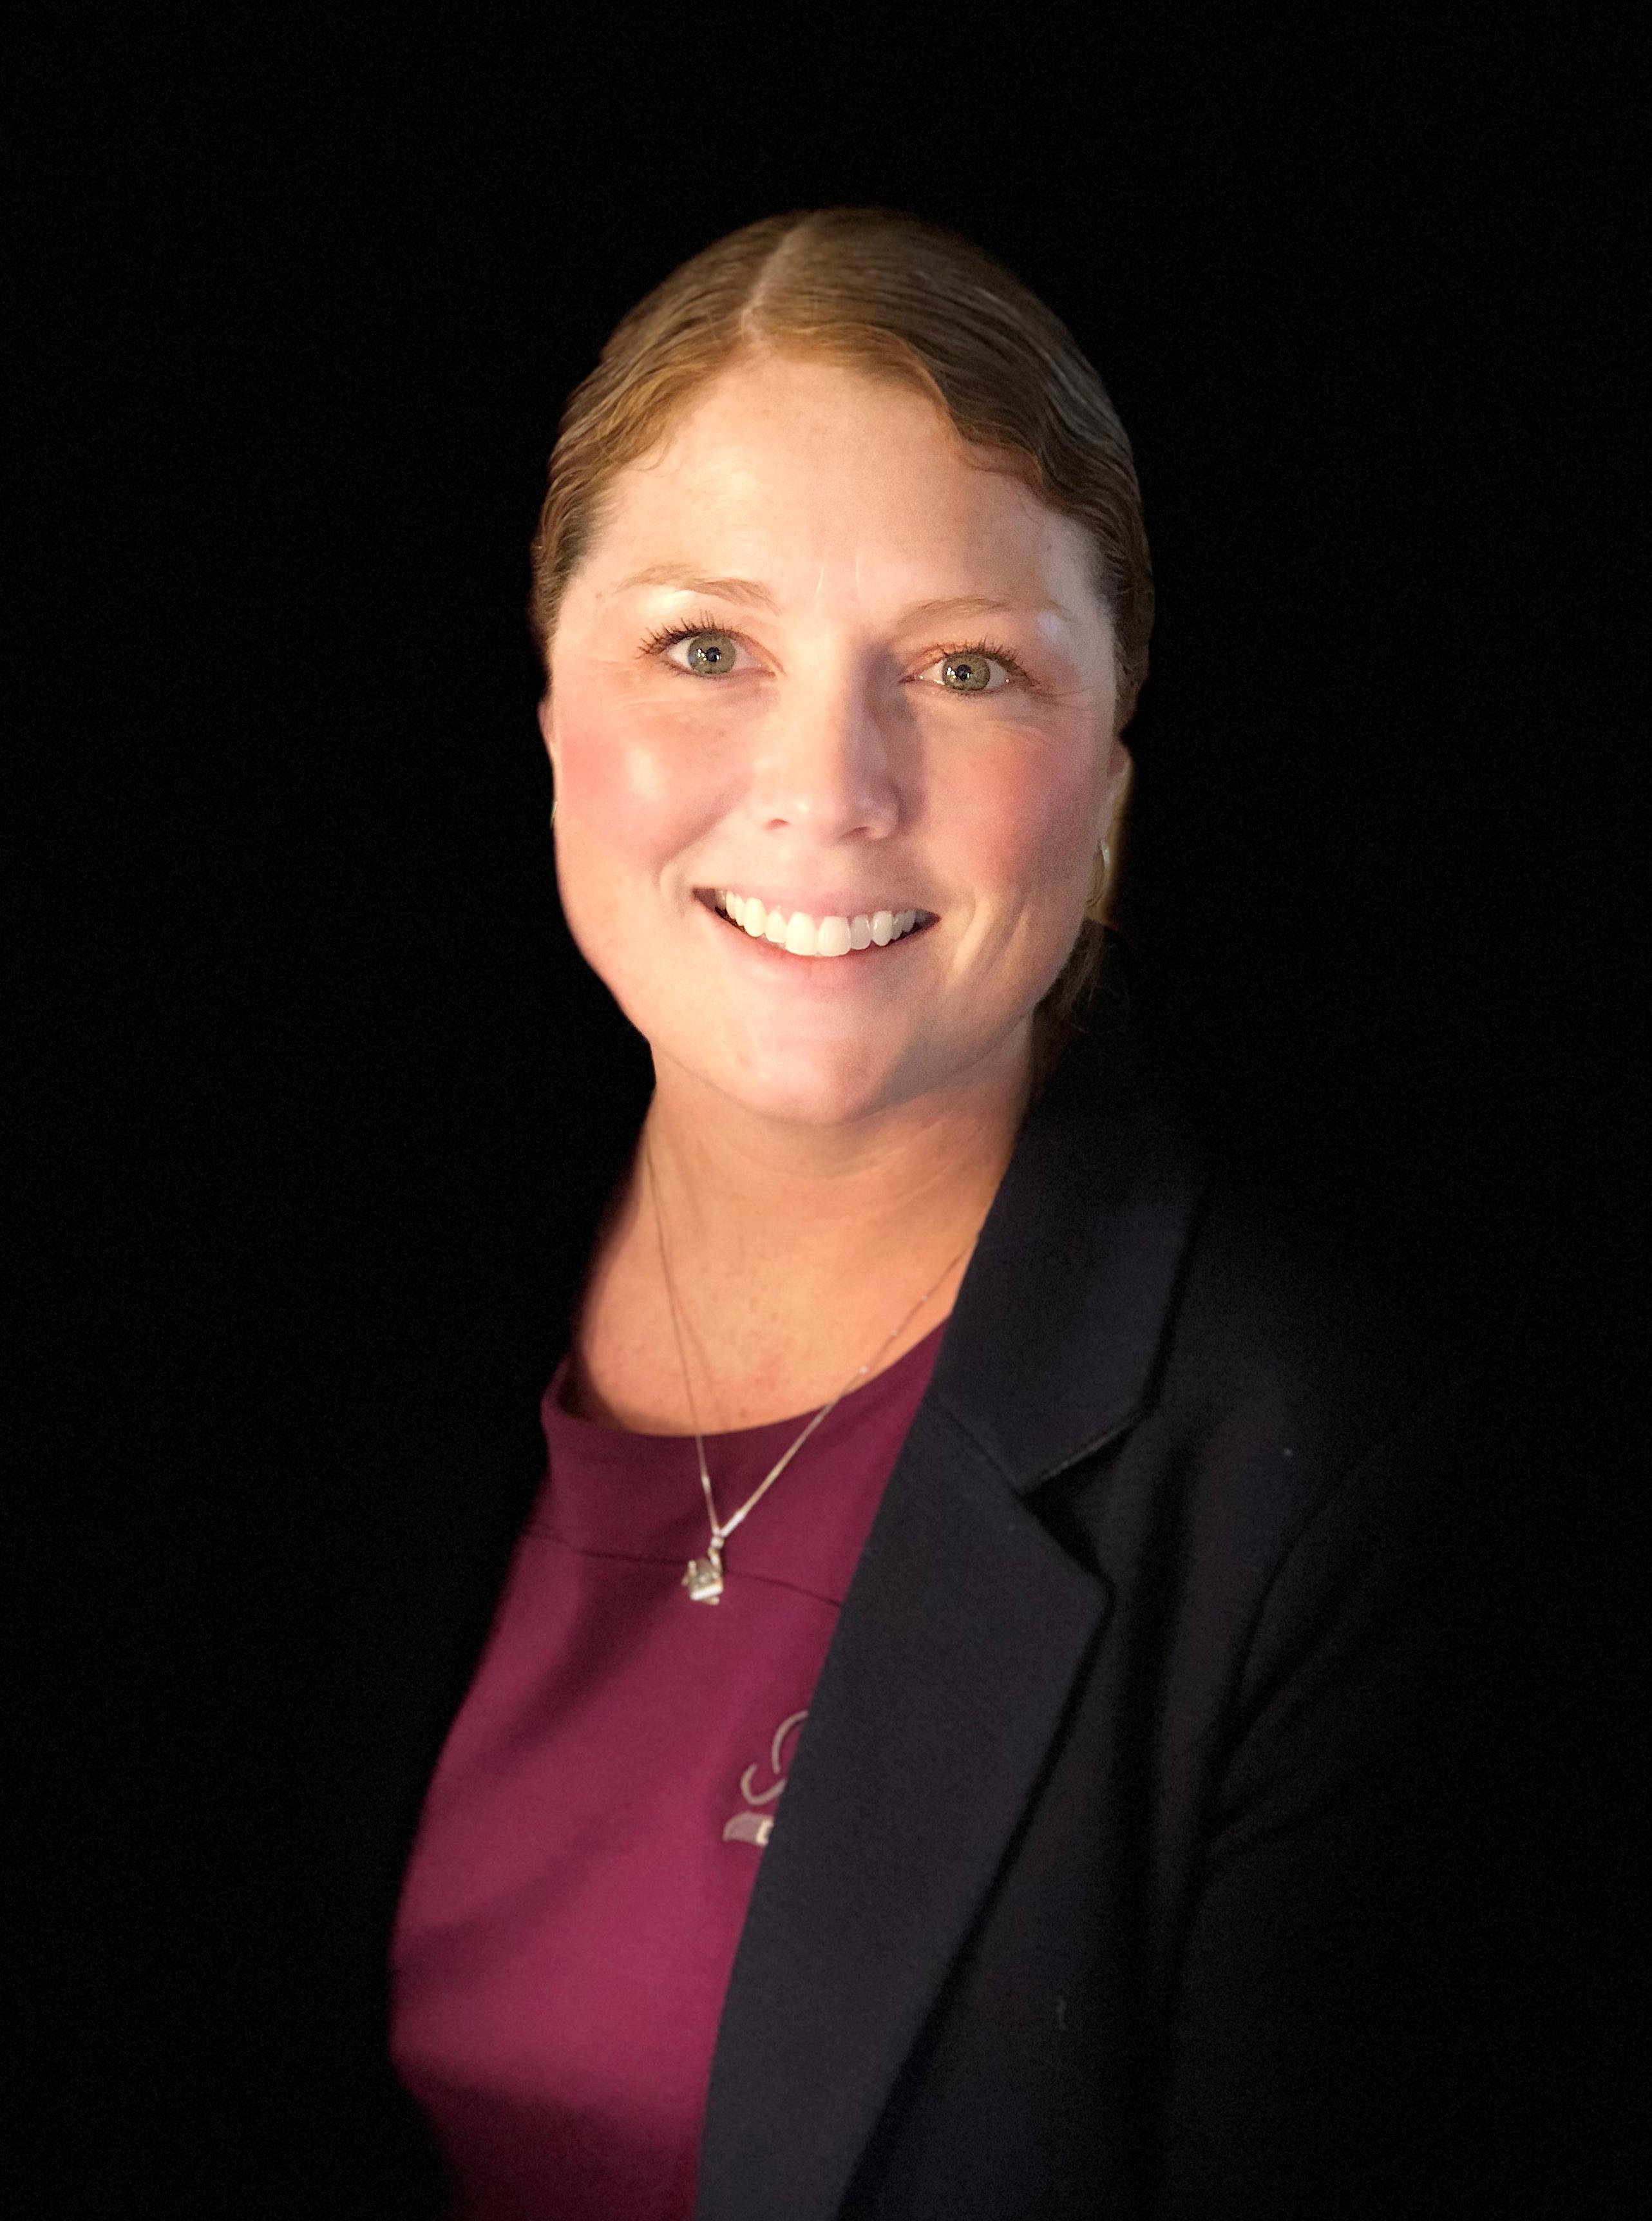 Crystal Grimaldi, Secretary